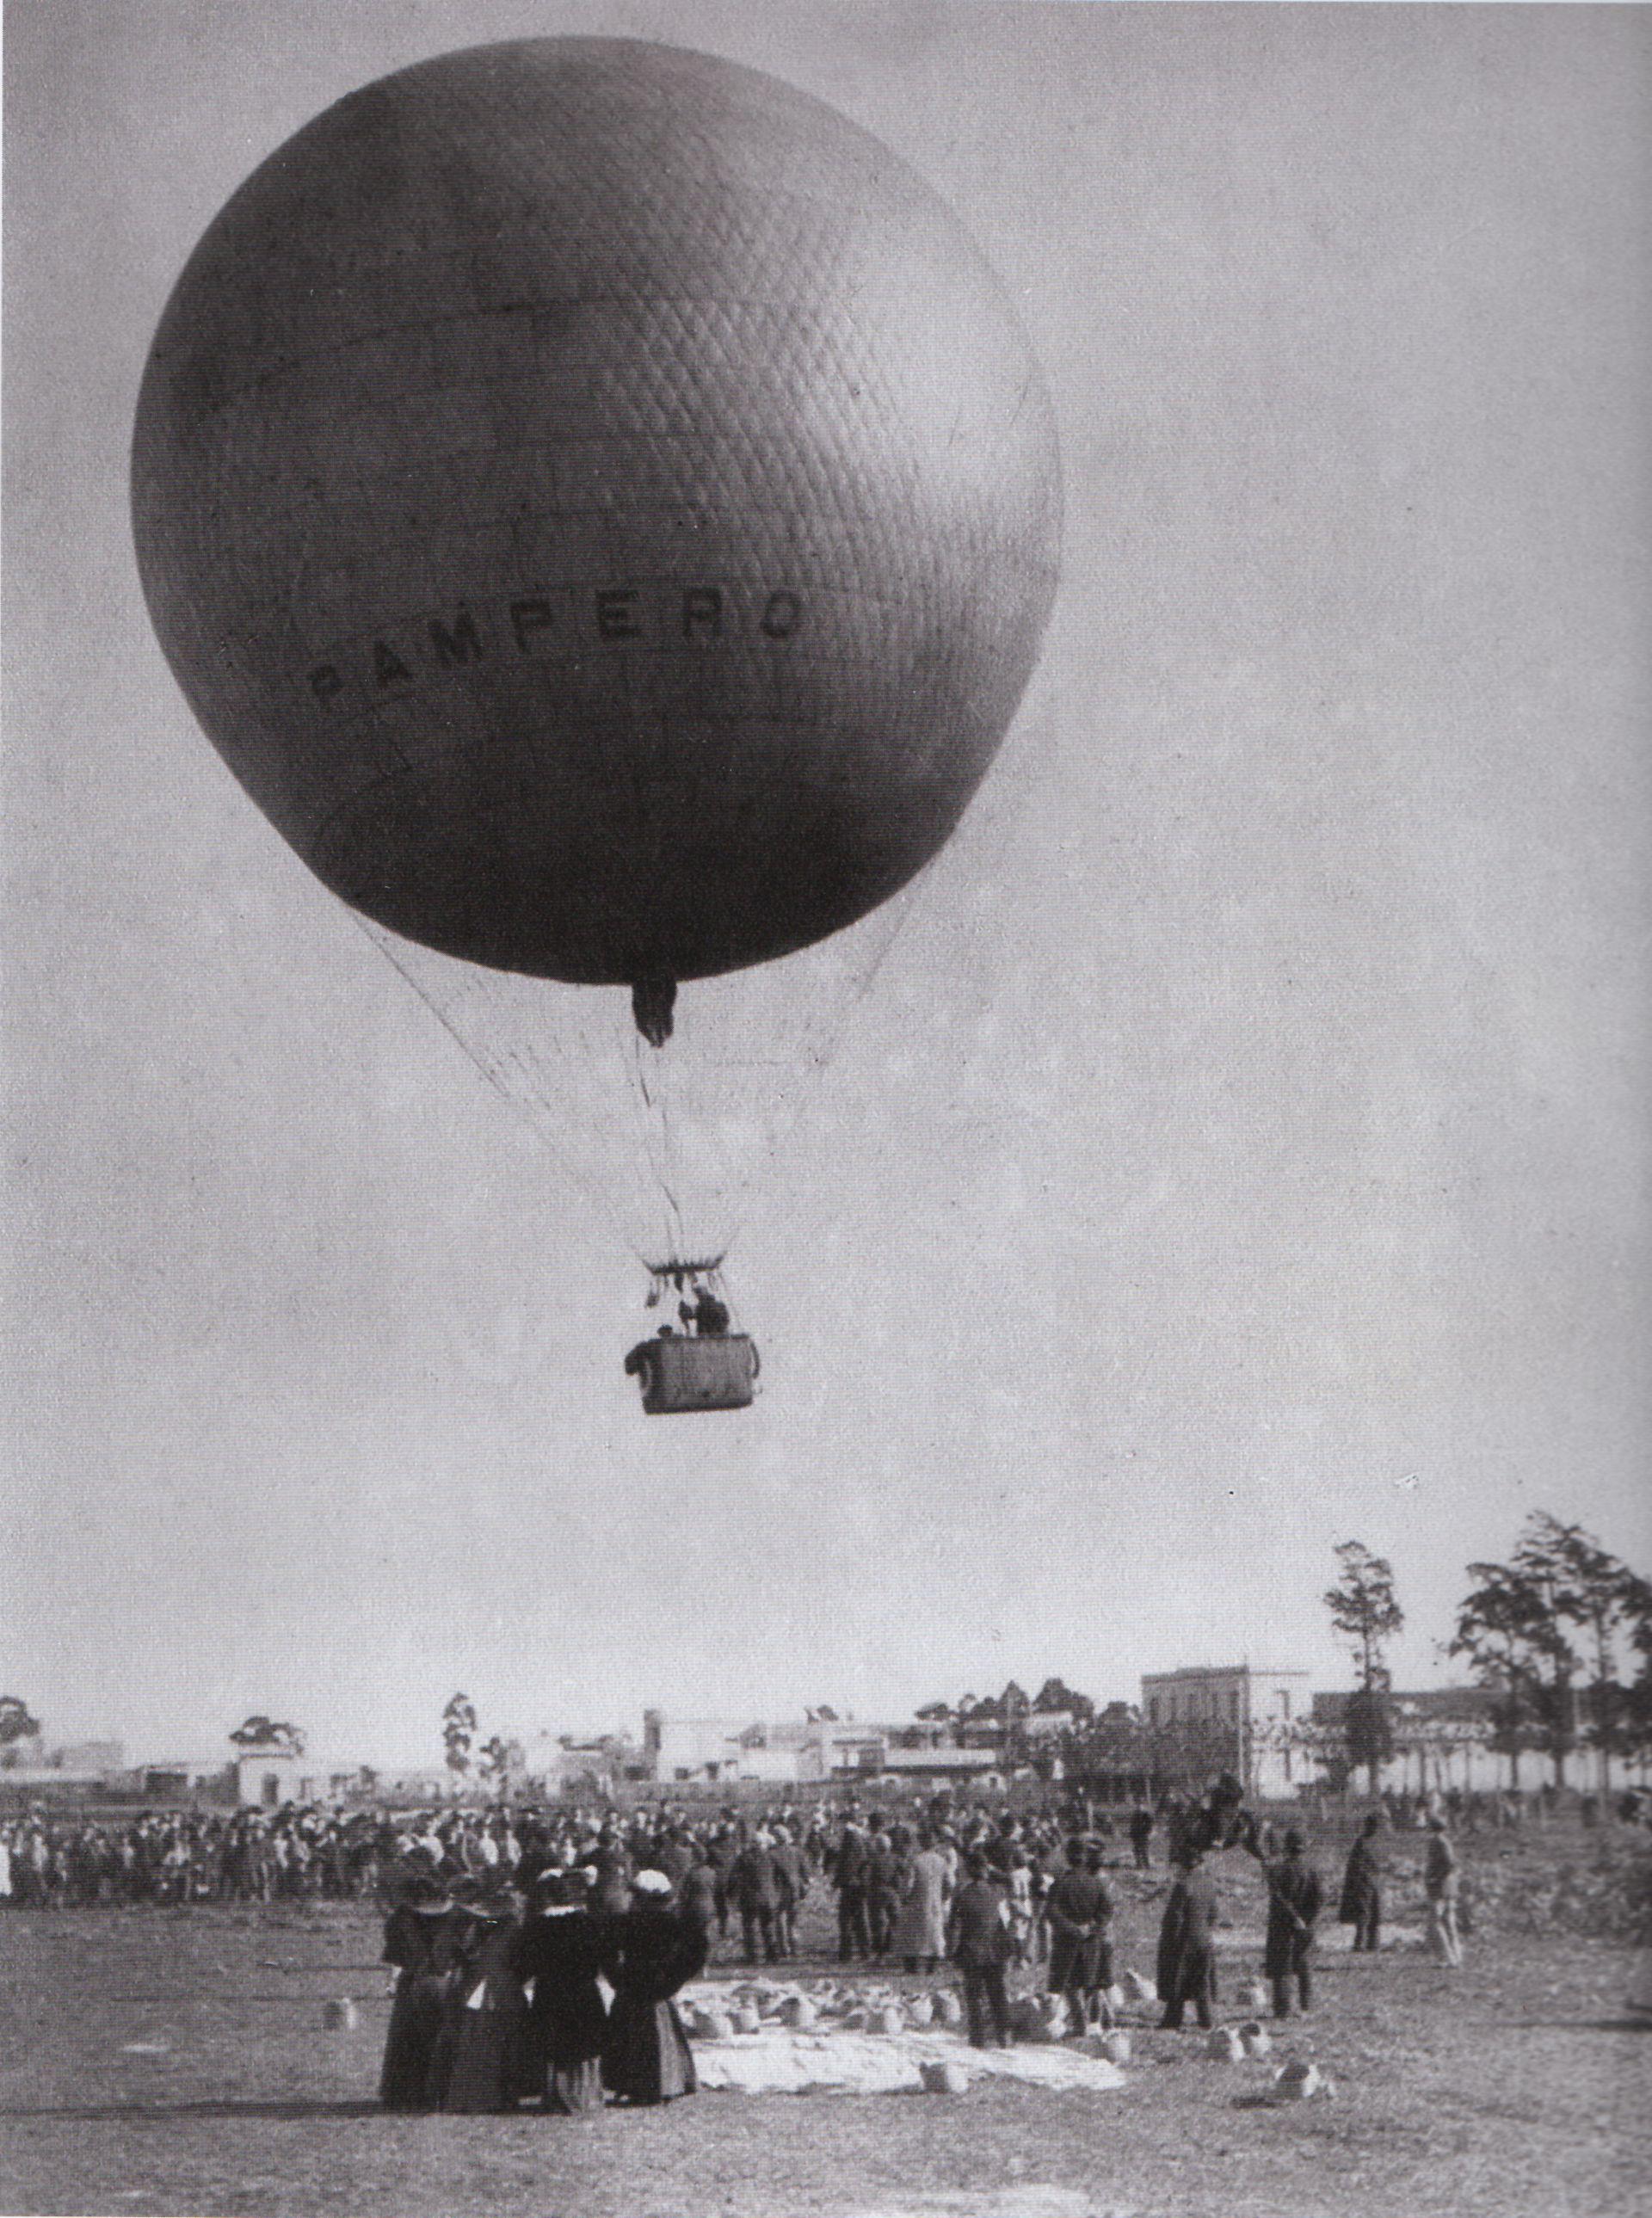 La vida del Pampero fue muy breve: de diciembre de 1907 (foto) a octubre de 1908.